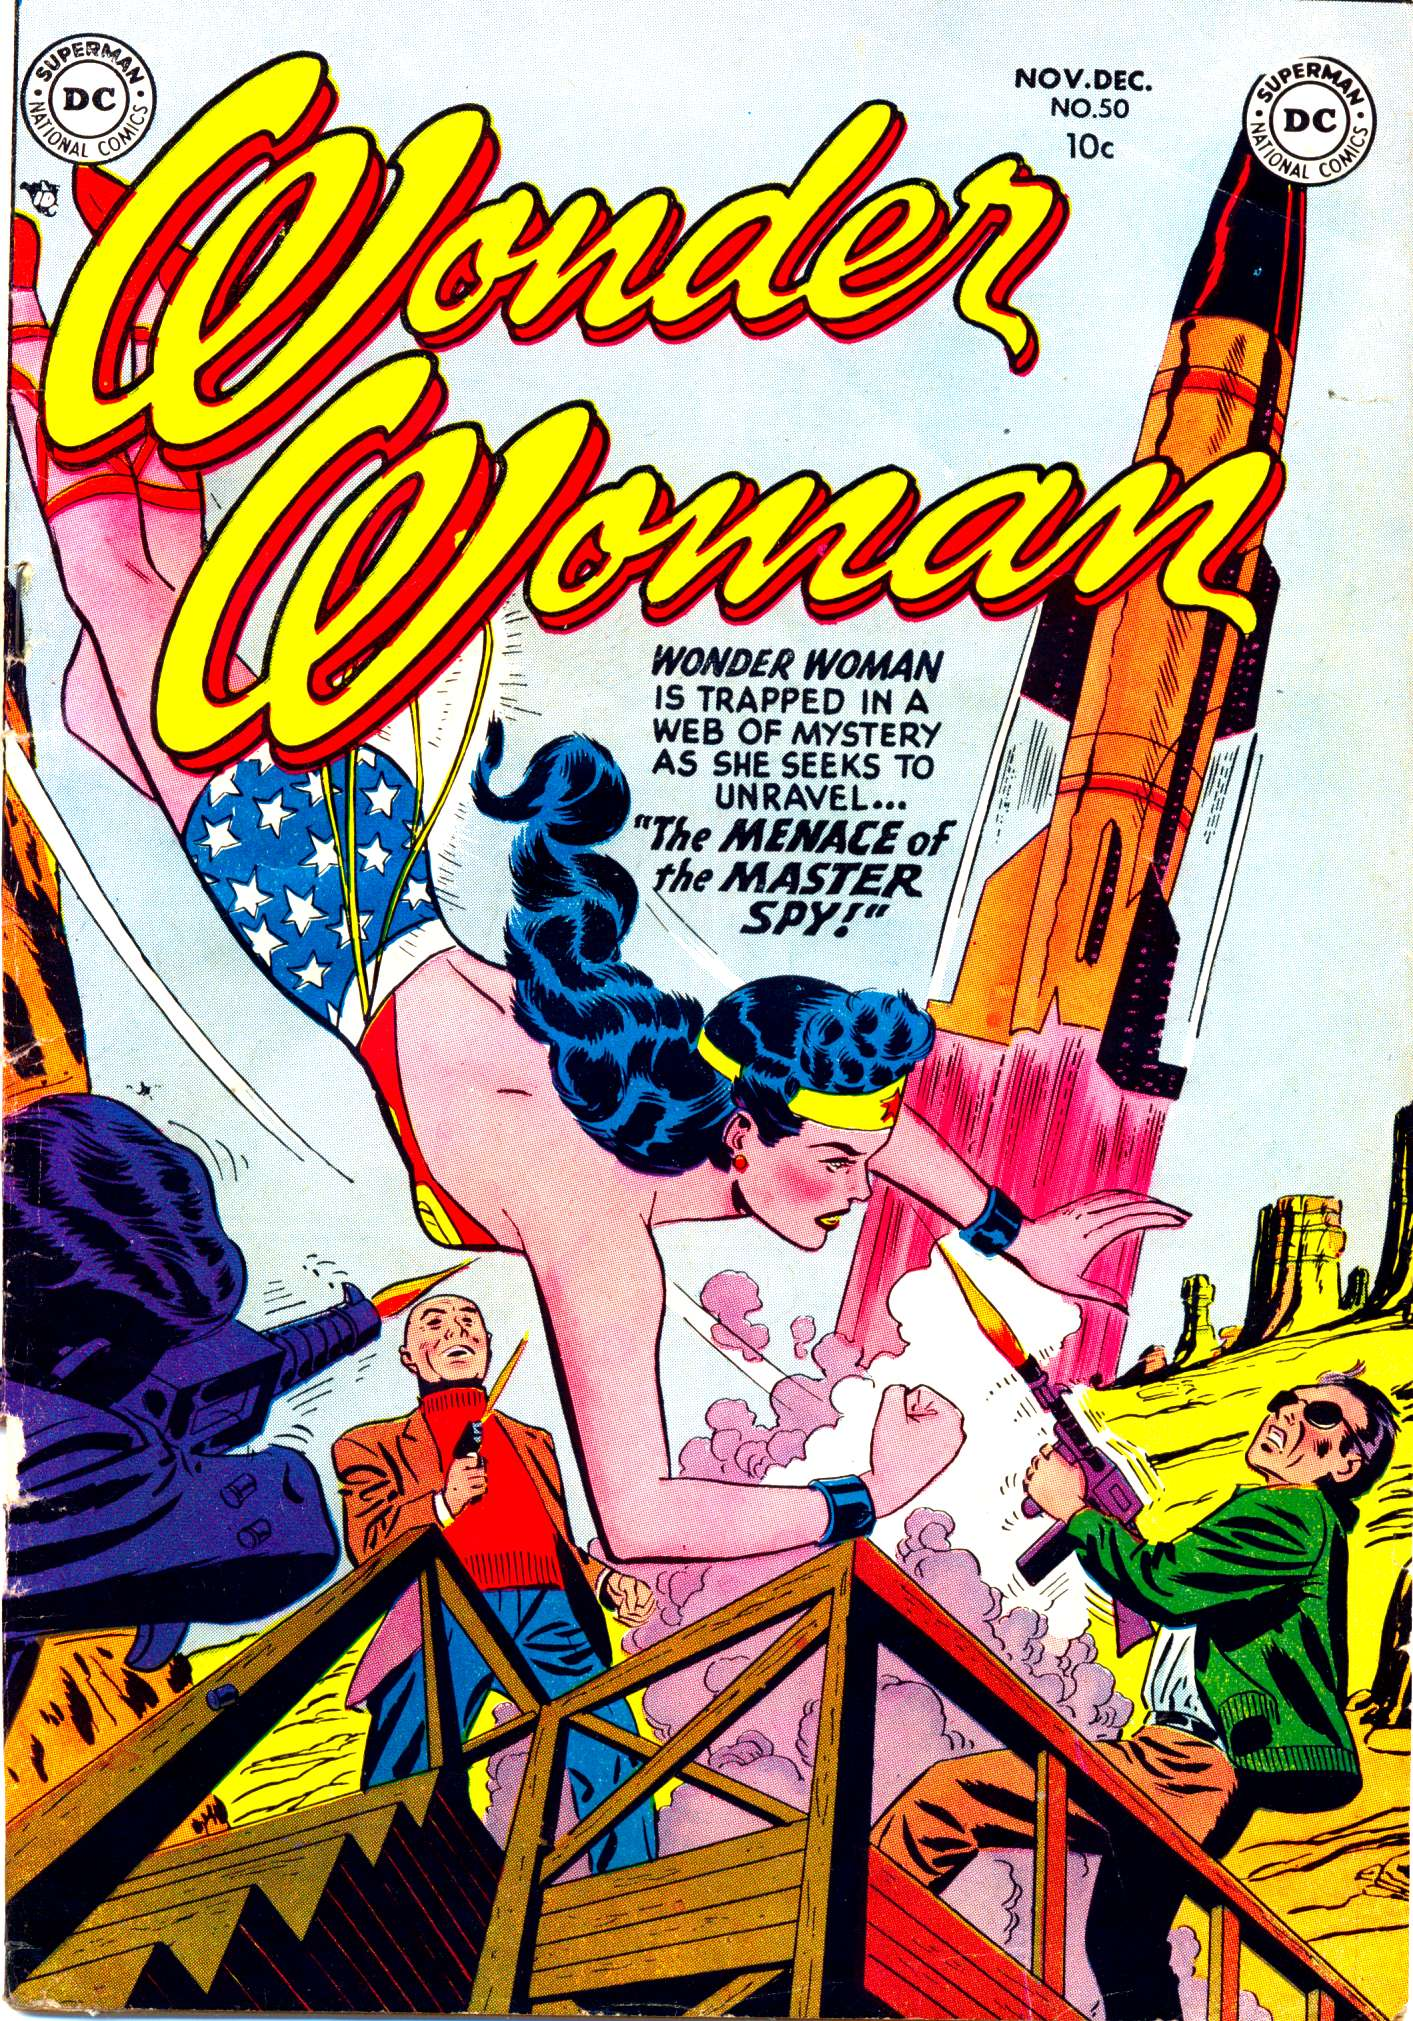 Read online Wonder Woman (1942) comic -  Issue #50 - 1